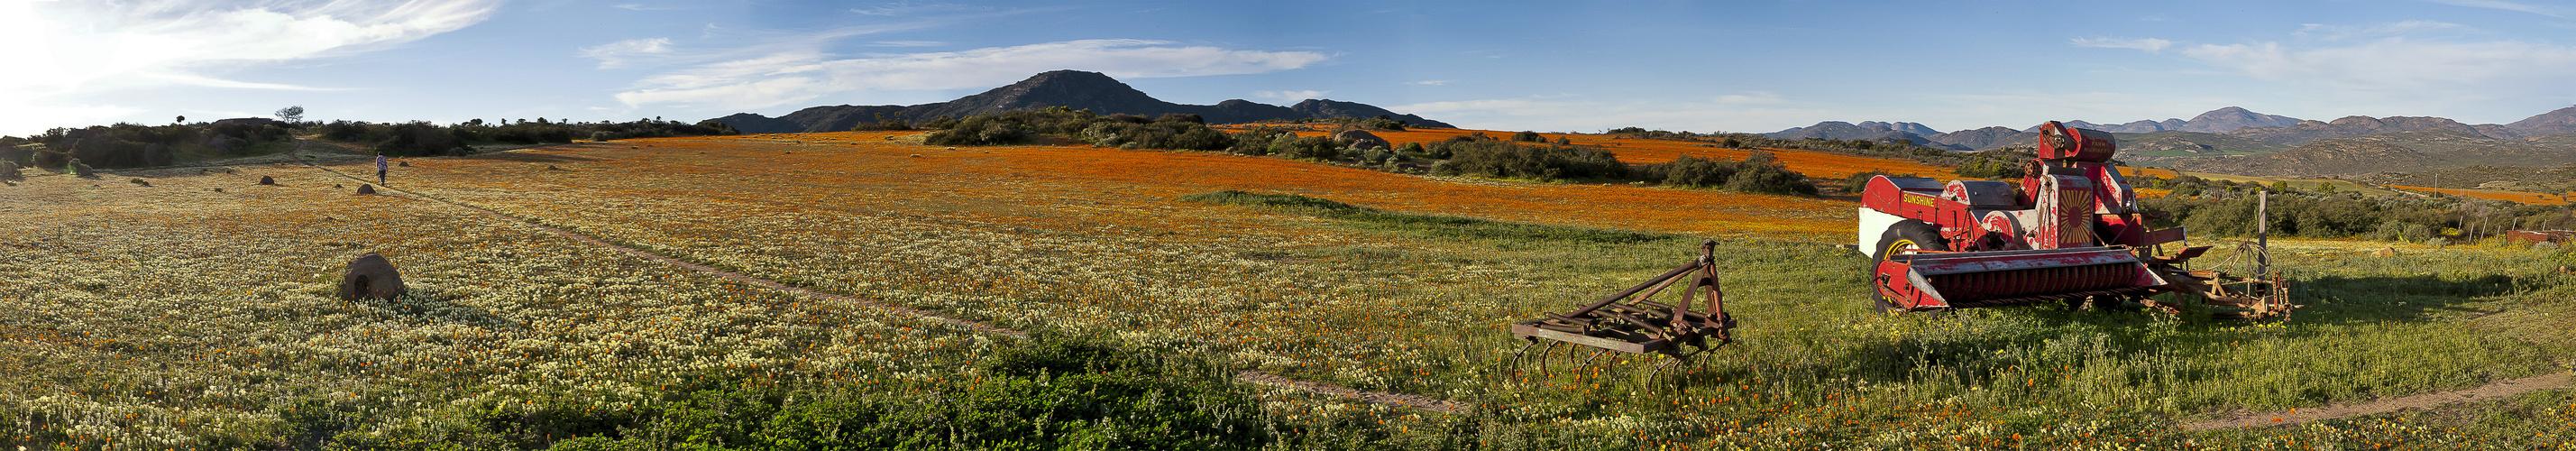 Namaqualand im Panorama